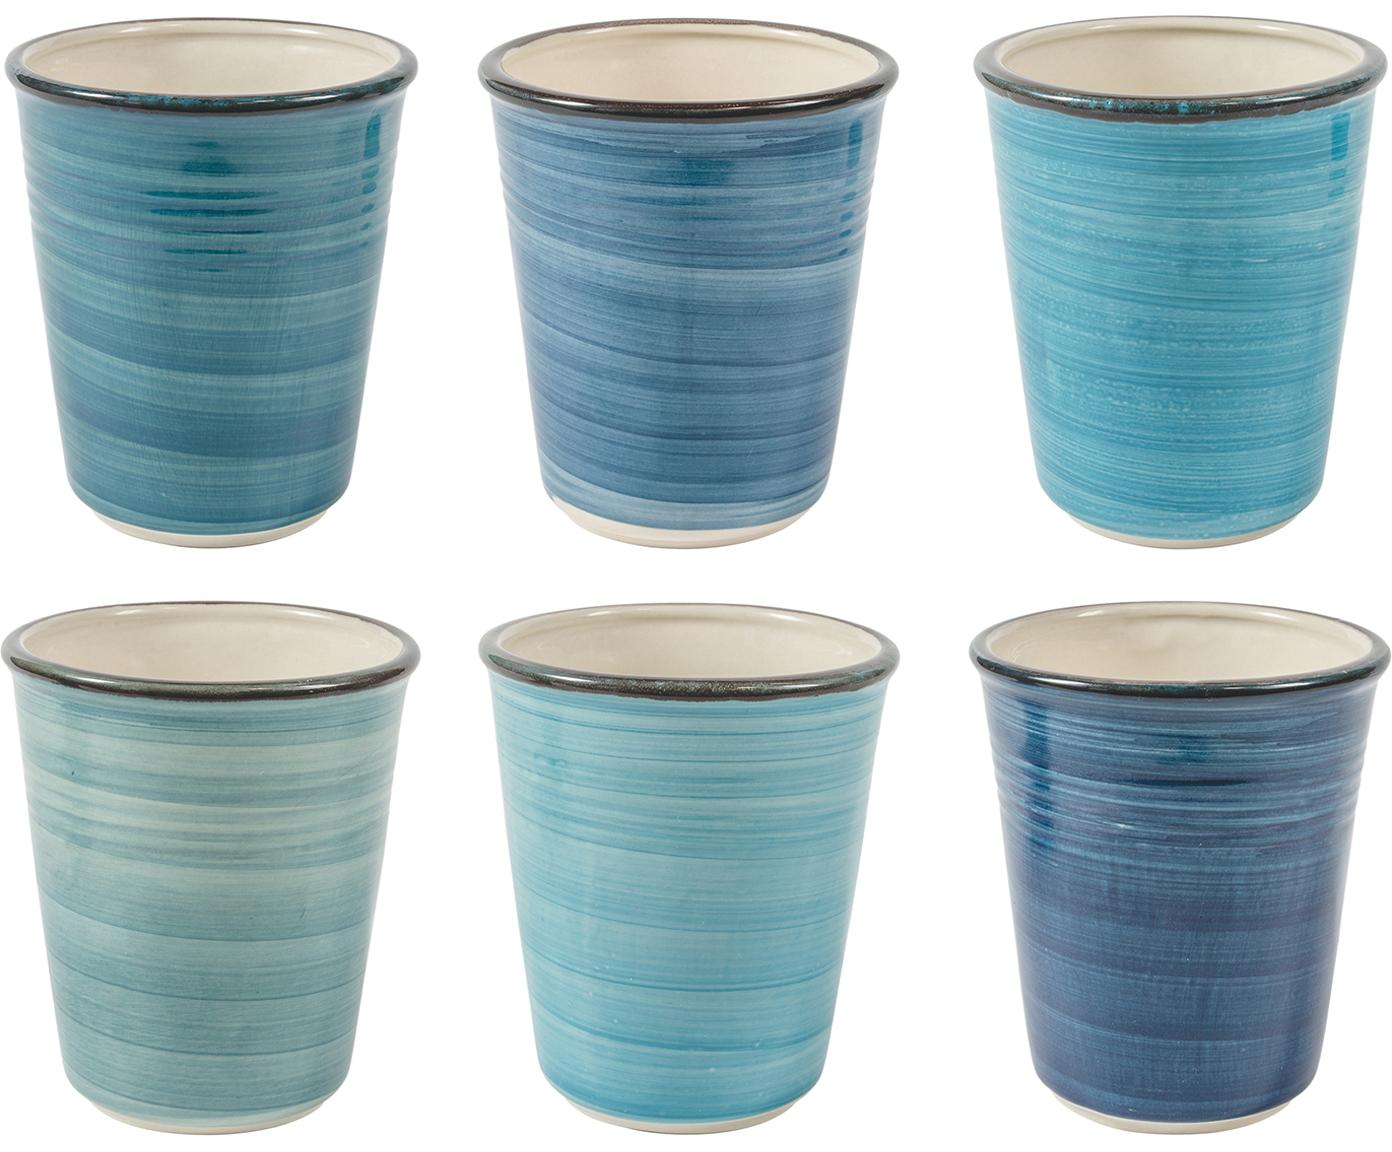 Set  6 tazze senza manico Baita, Gres, Tonalità blu, grigio, beige, Ø 9 x Alt. 11 cm